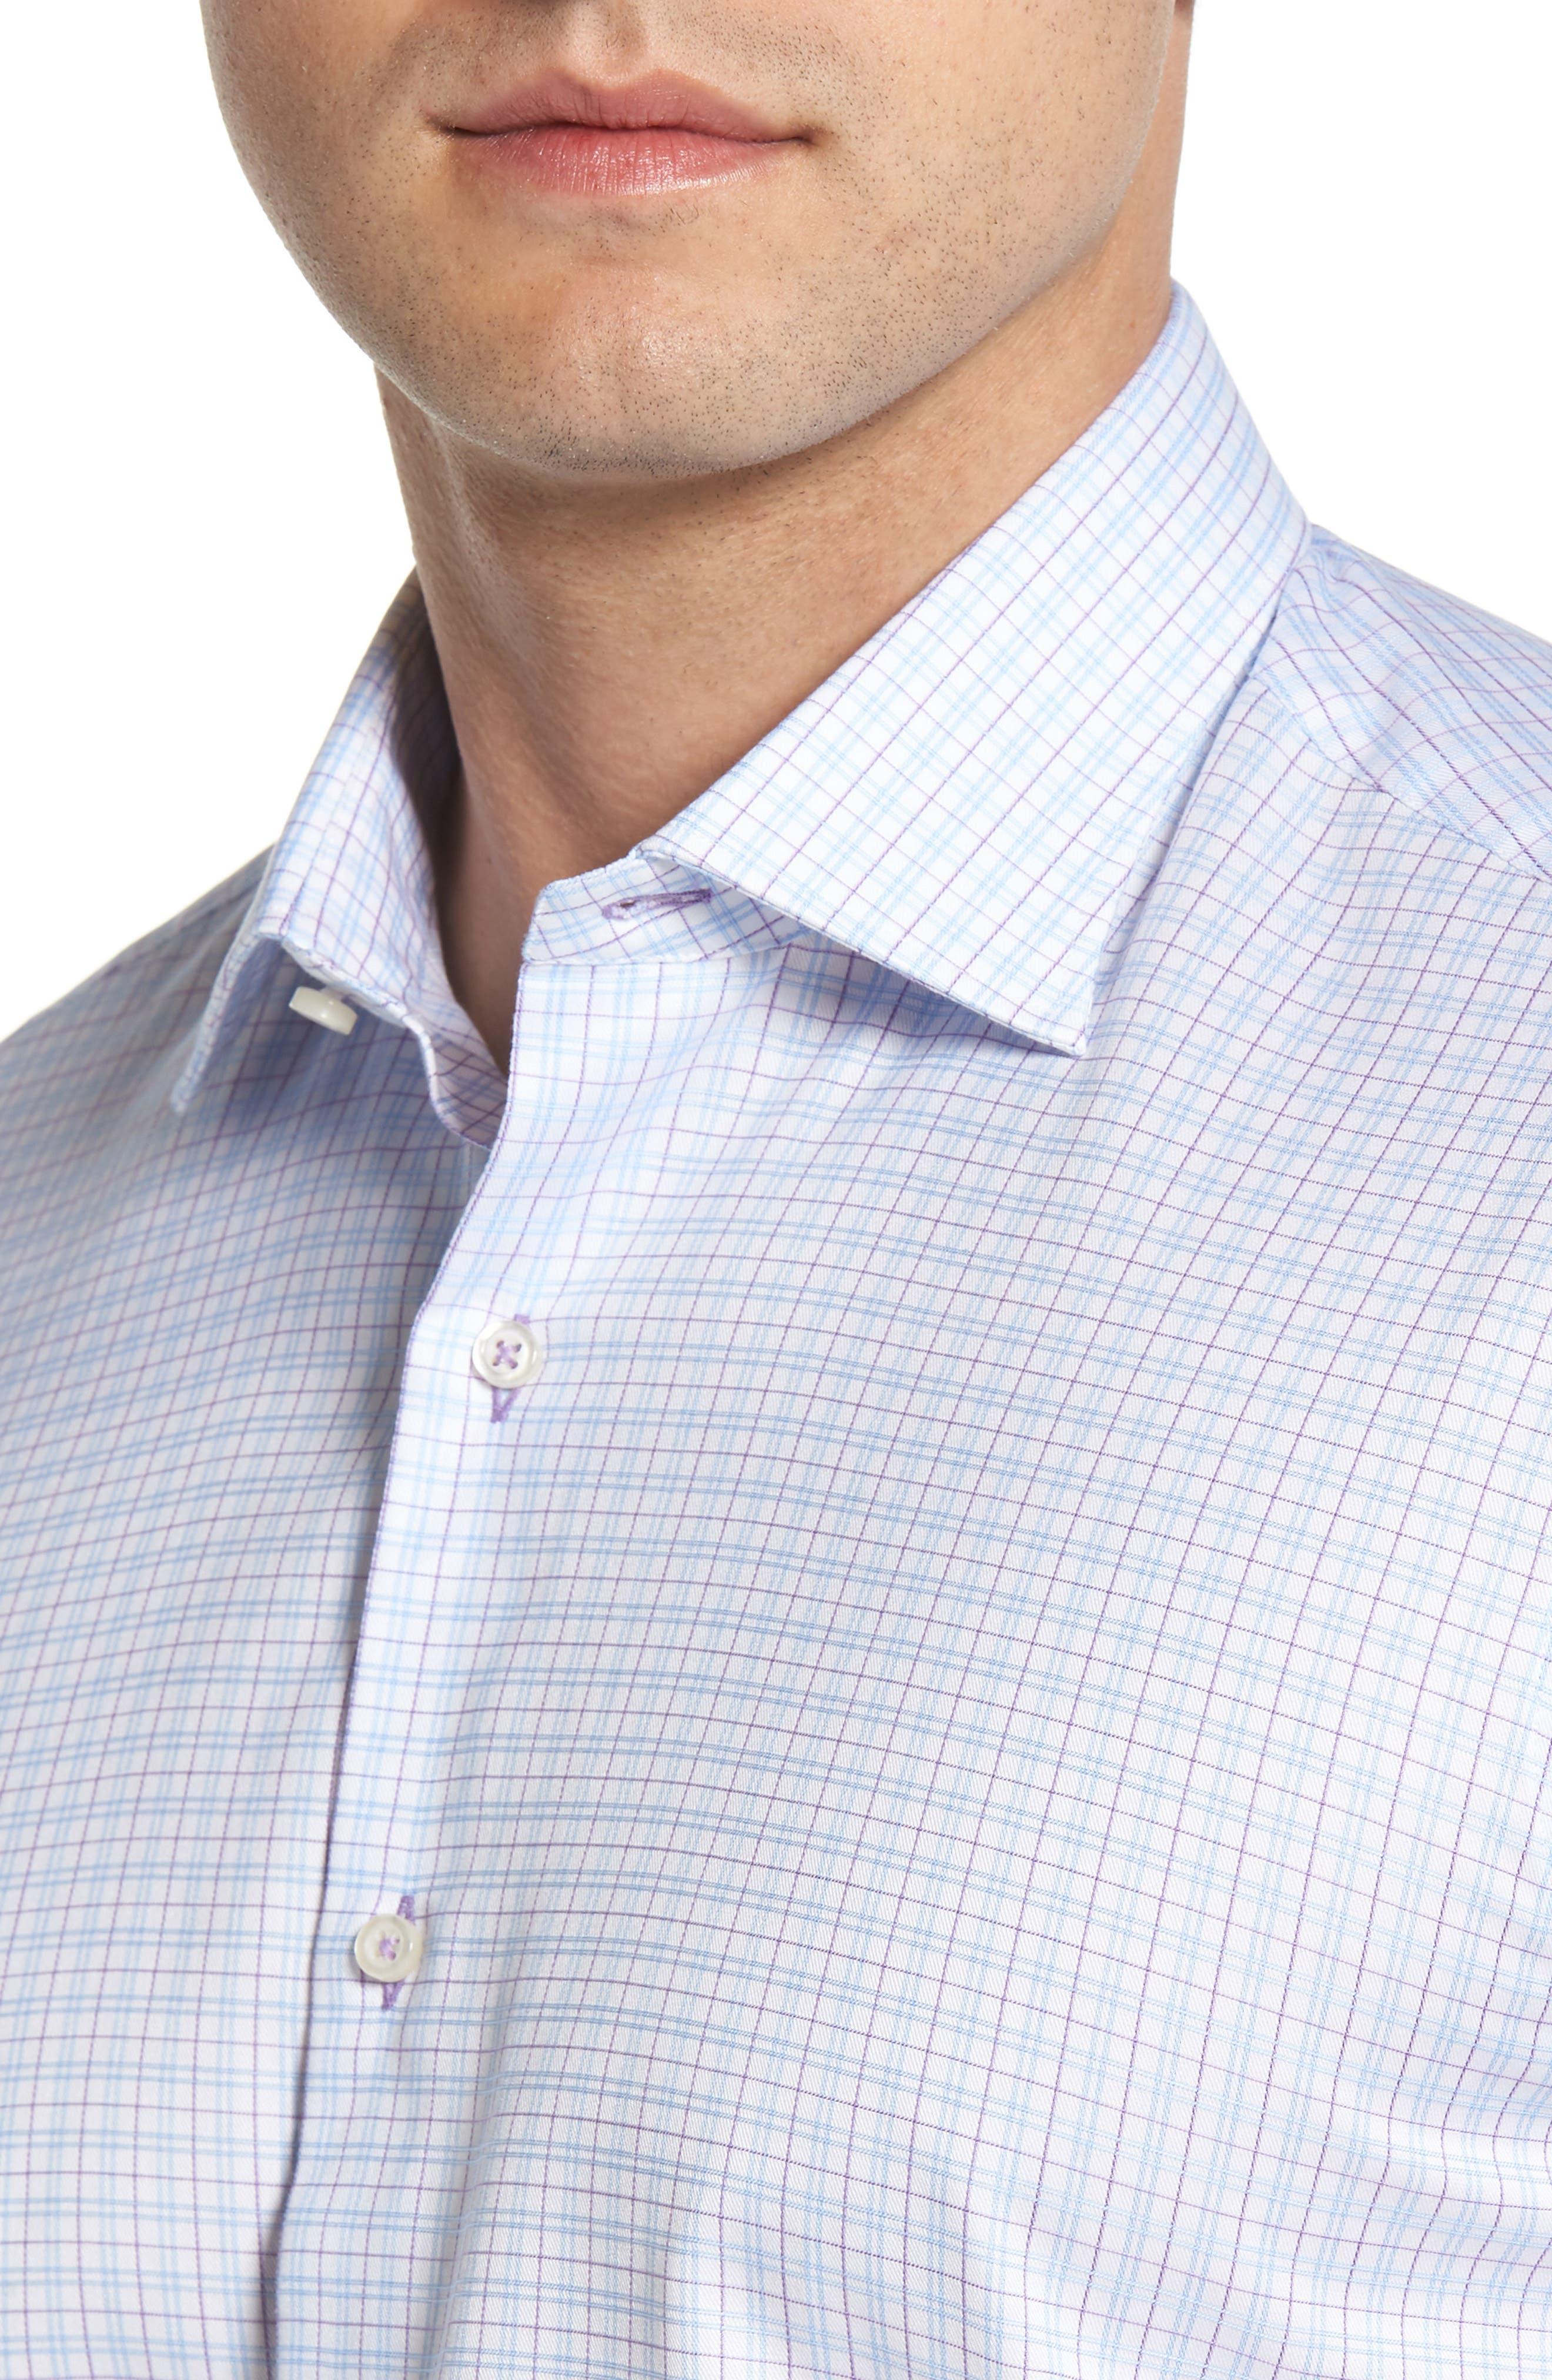 Regular Fit Check Dress Shirt,                             Alternate thumbnail 2, color,                             WHITE MULTI